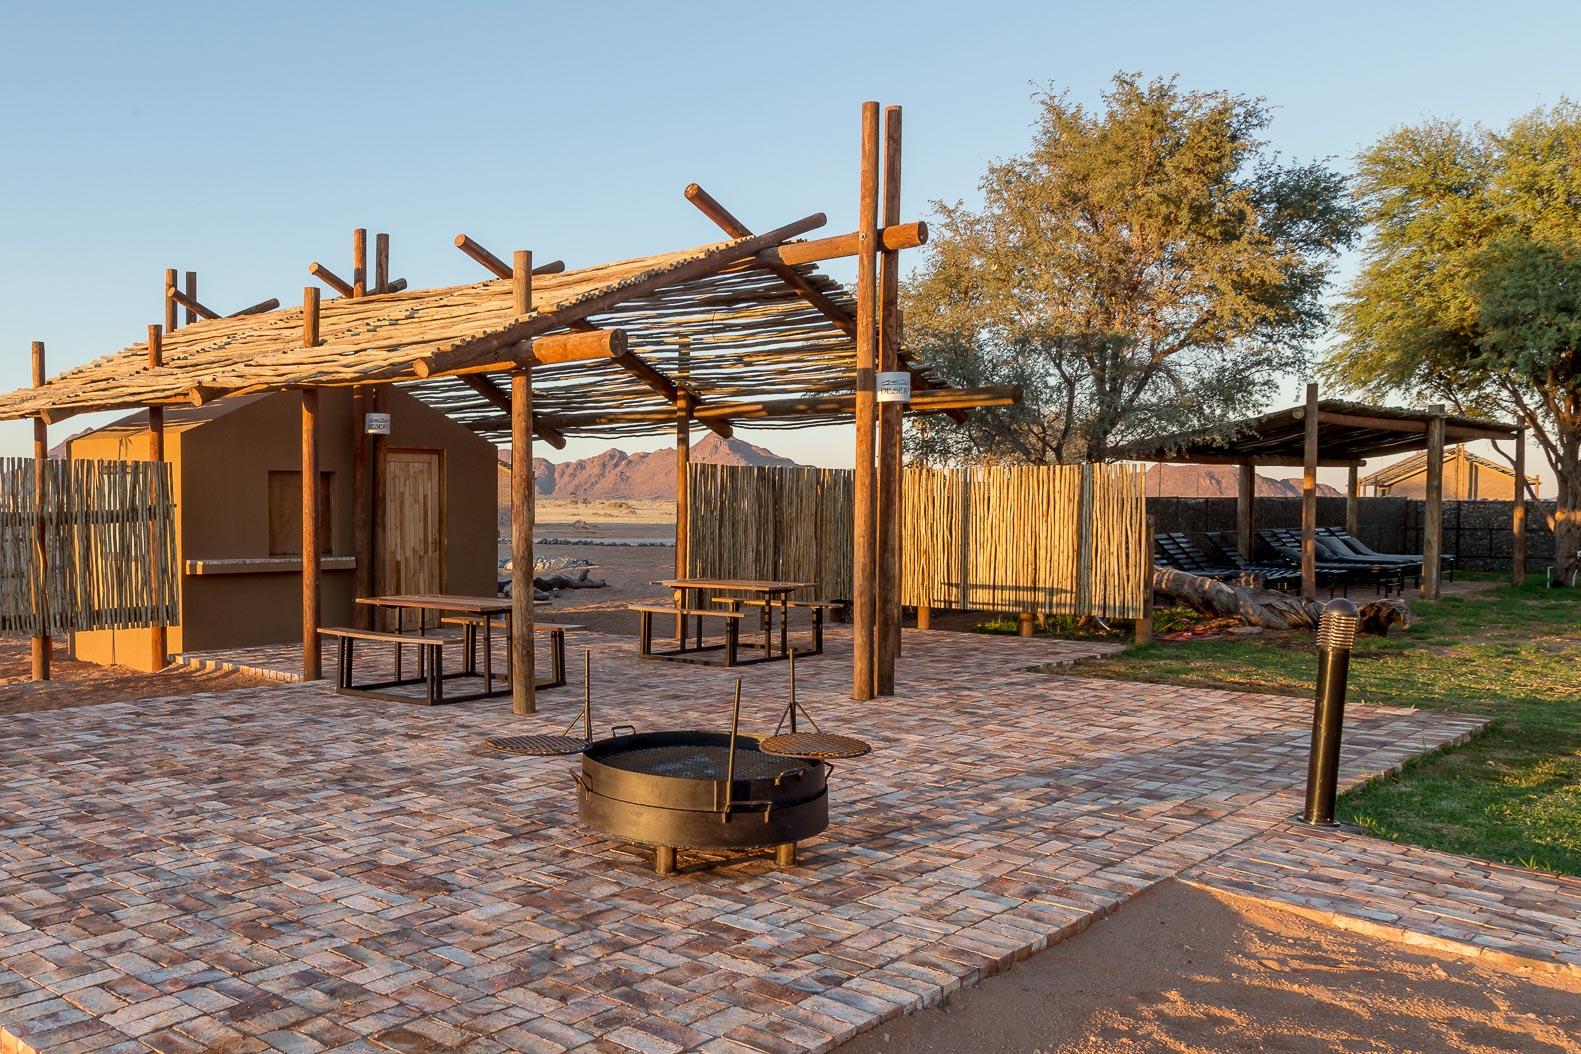 Desert-Camp-Namibia-26